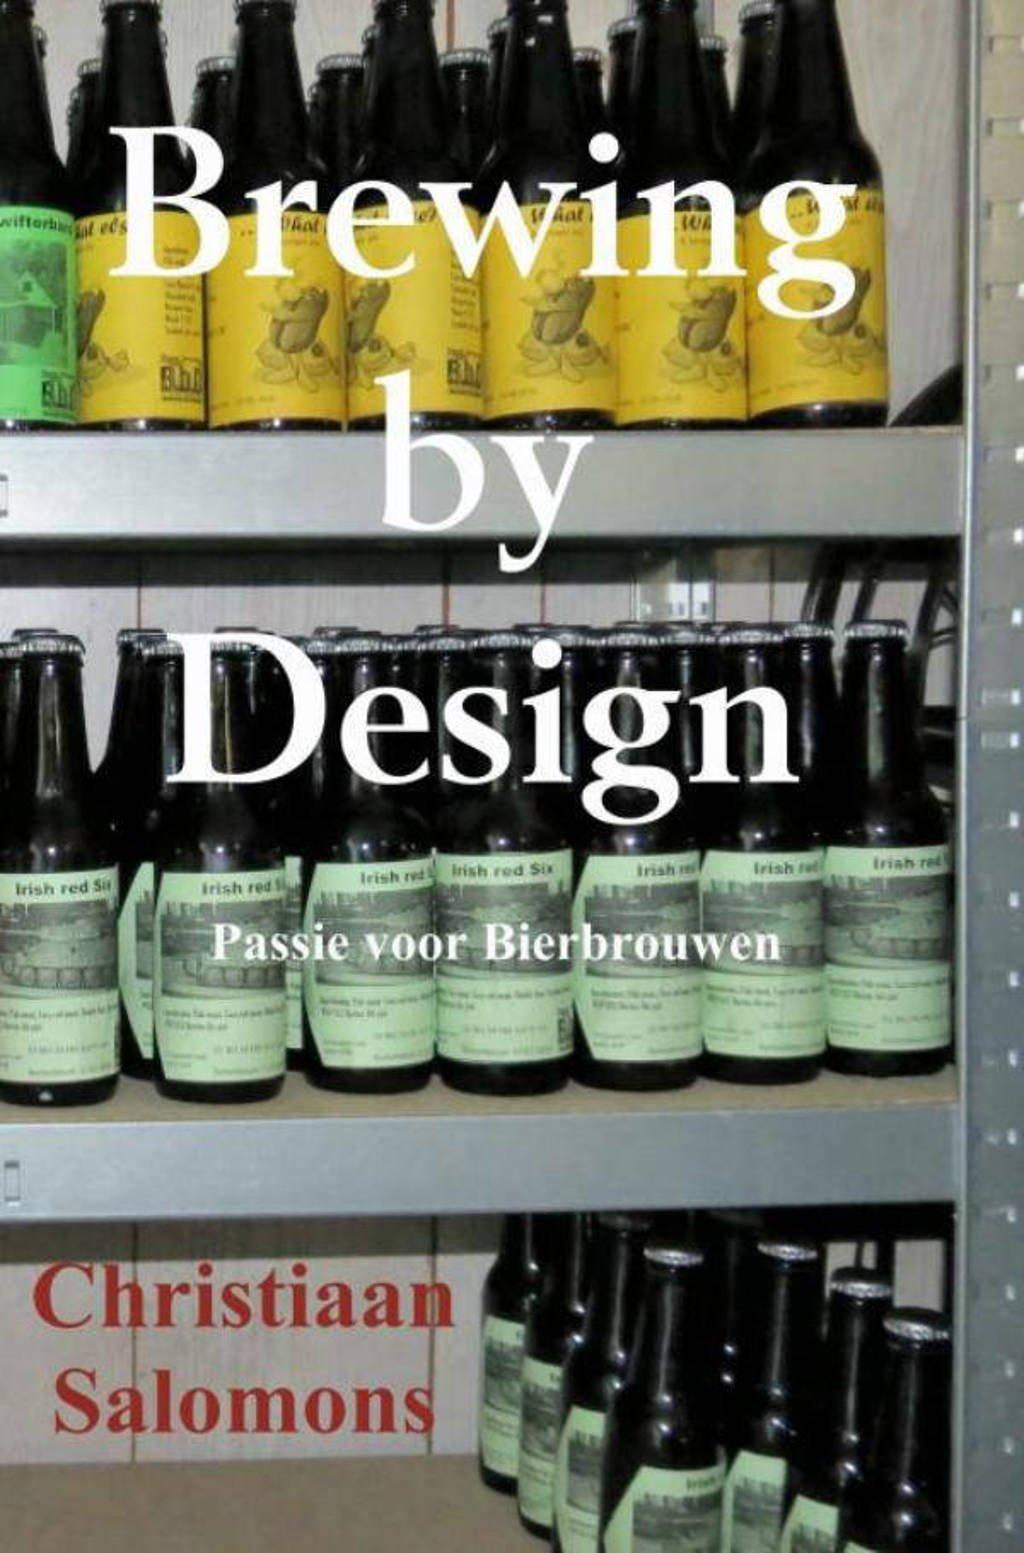 Brewing by Design - Christiaan Salomons